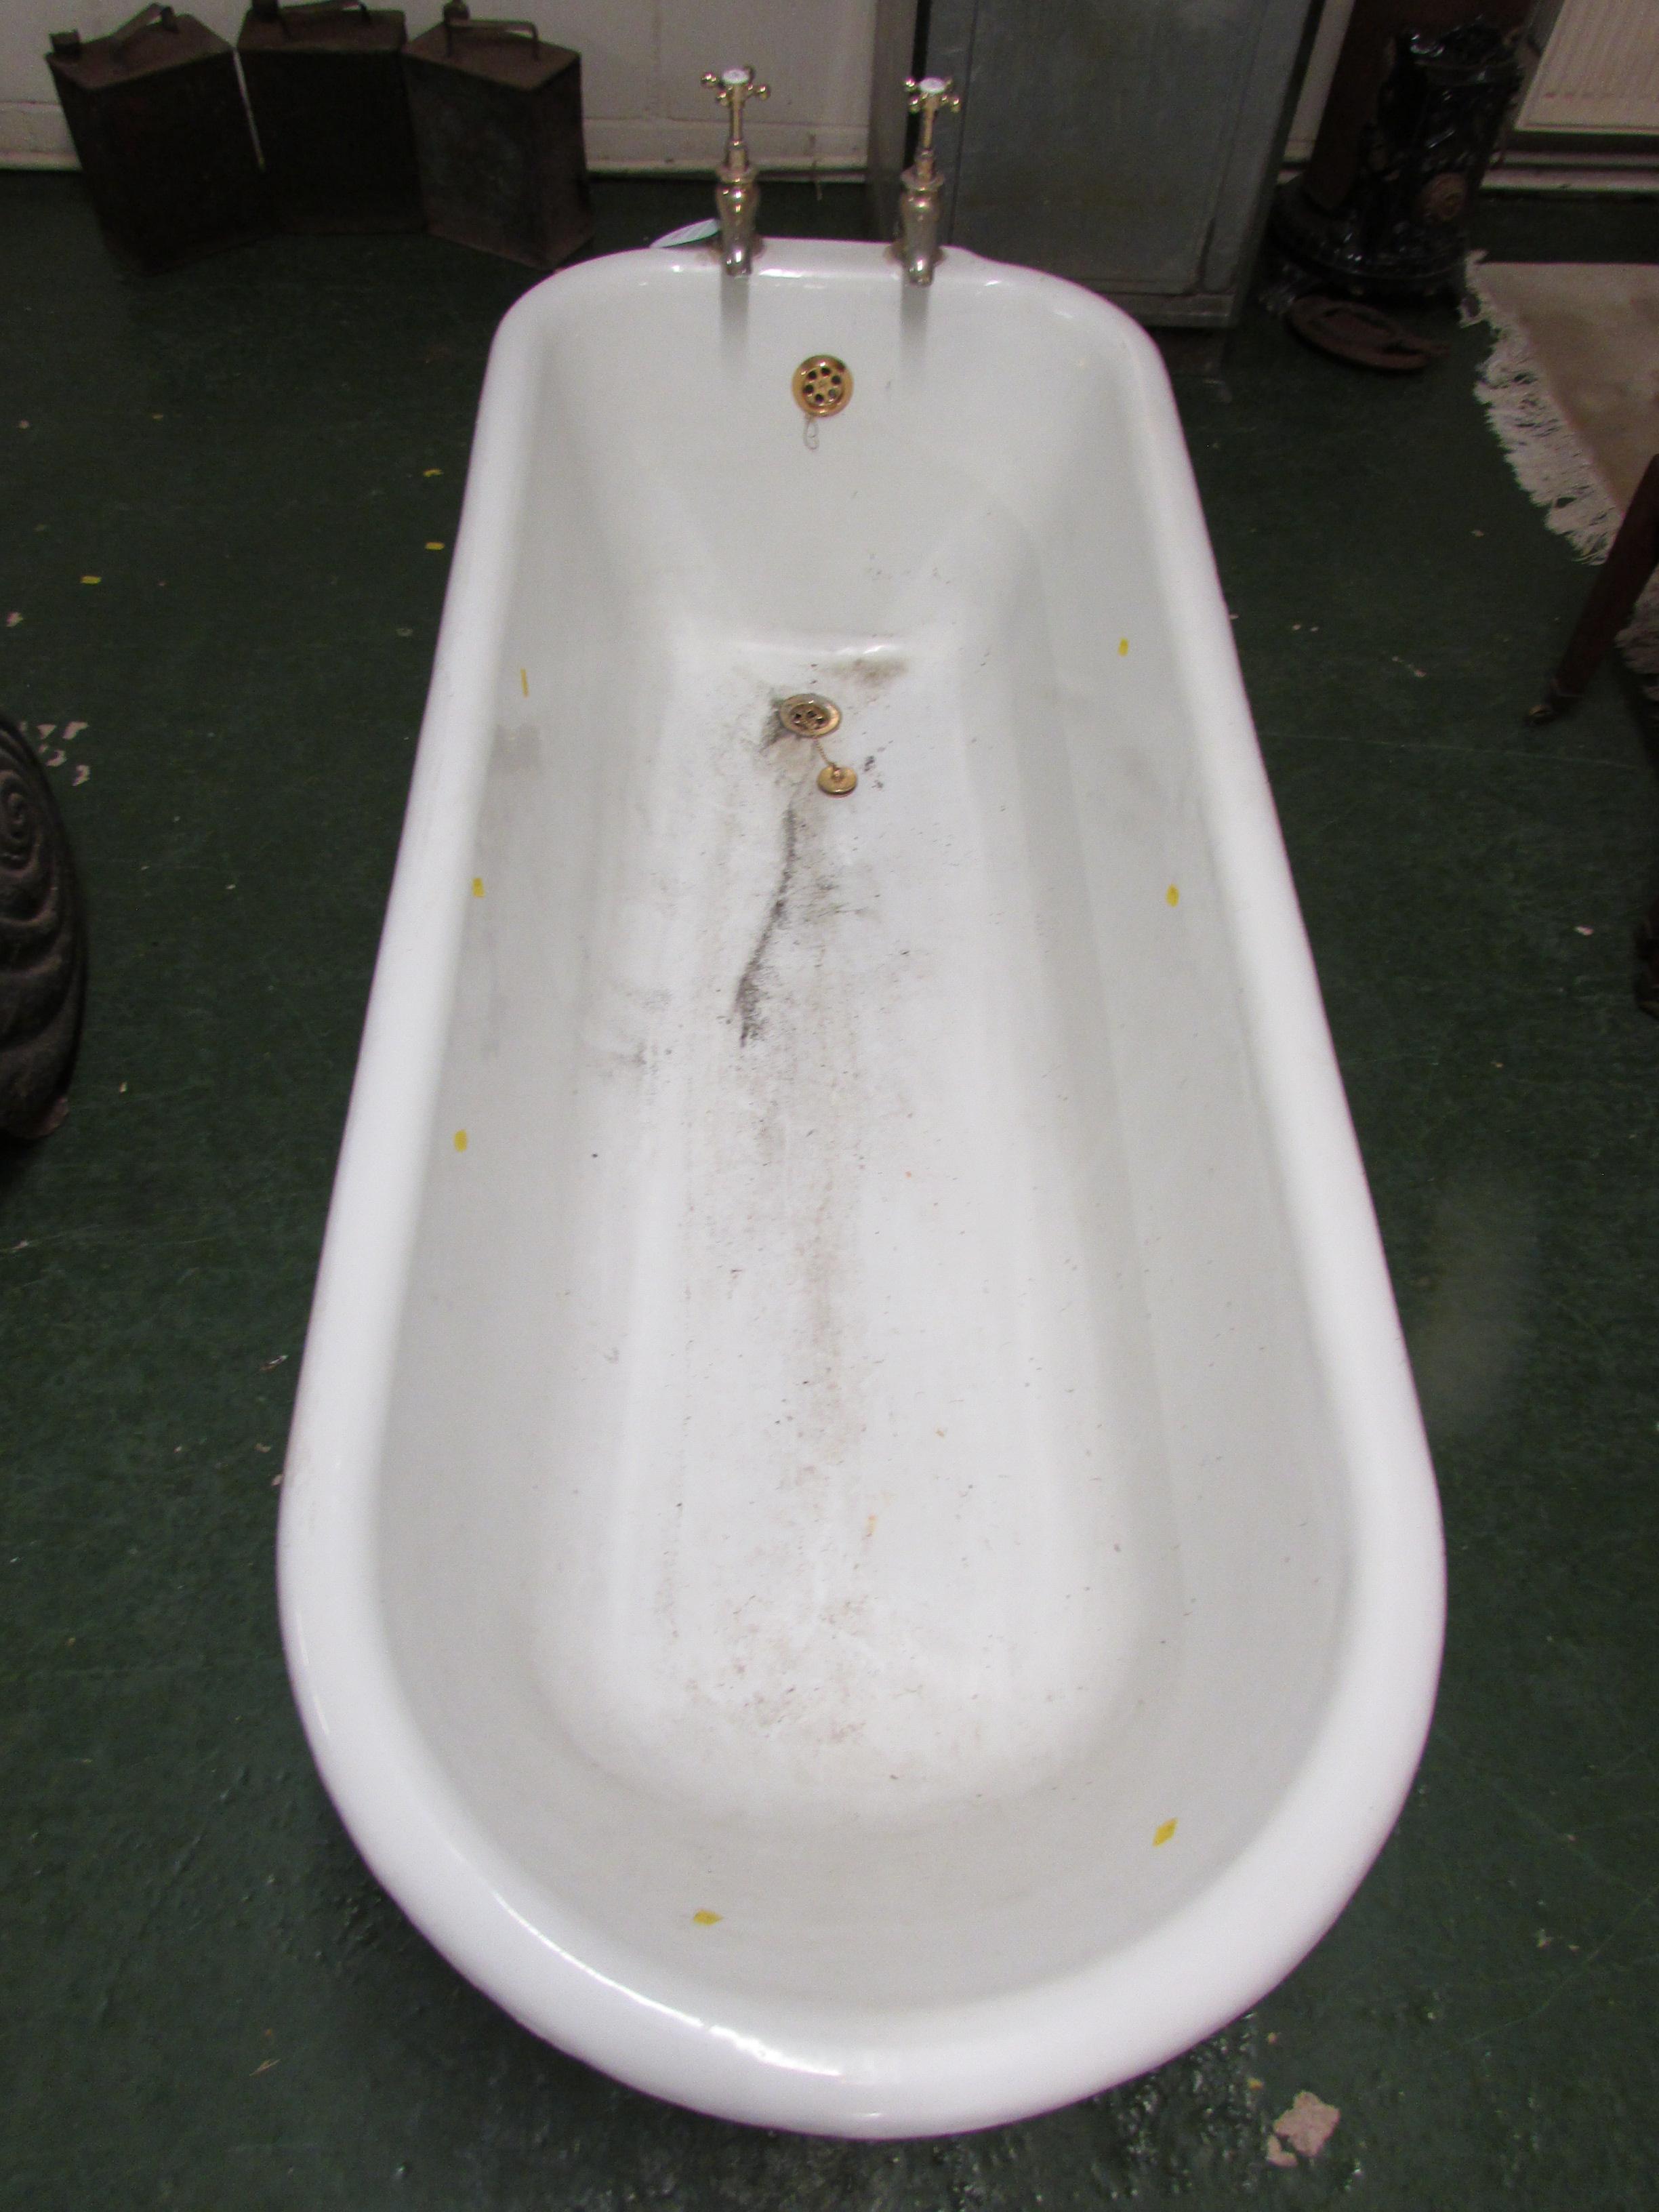 Lot 34 - Cast iron enamel bath, white to the interior, black to the exterior, raised on four feet and